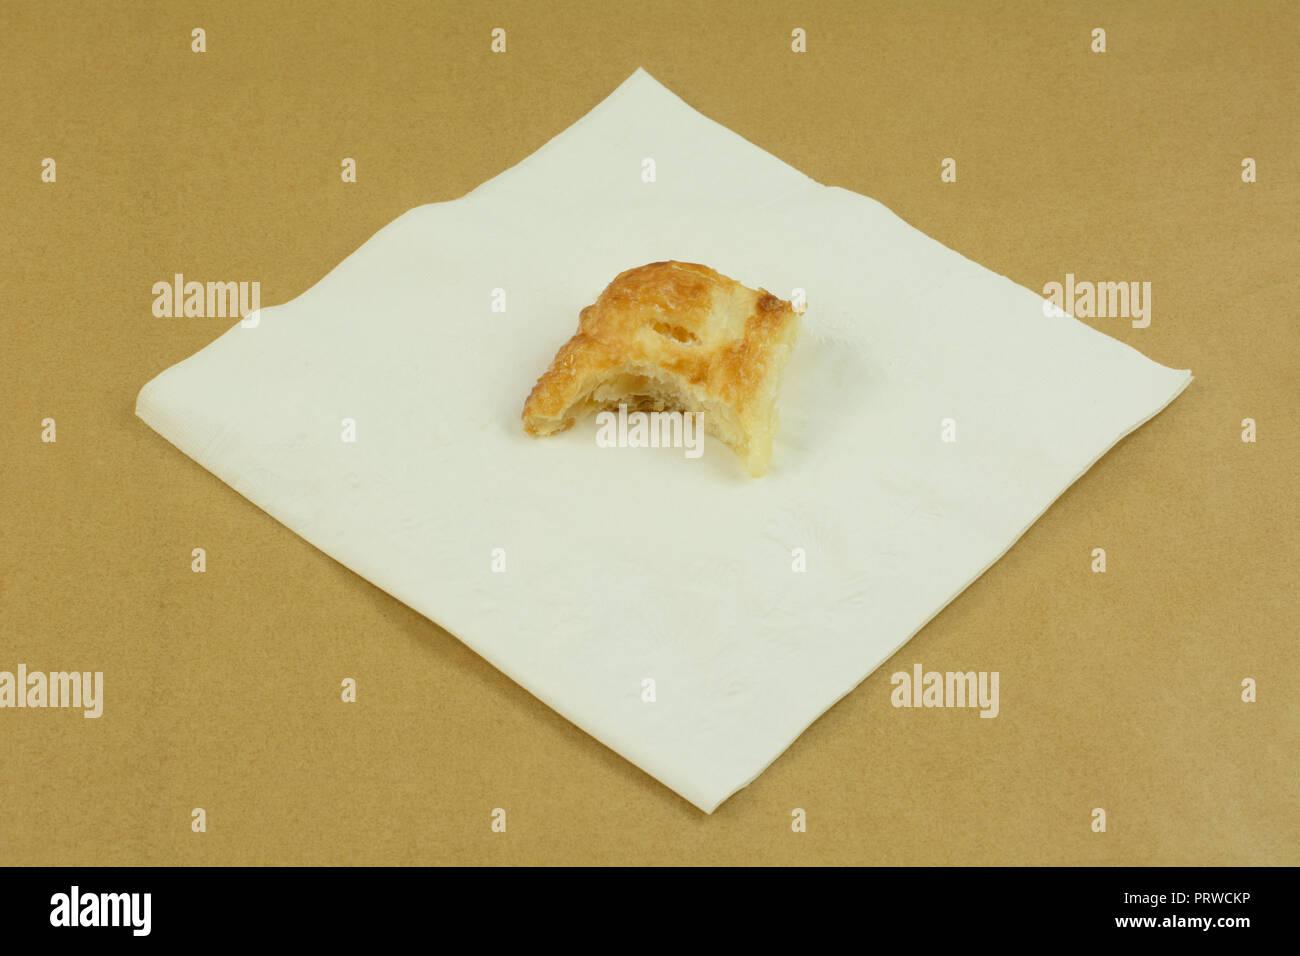 Mini apple breakfast turnover with bite eaten on white napkin on table - Stock Image